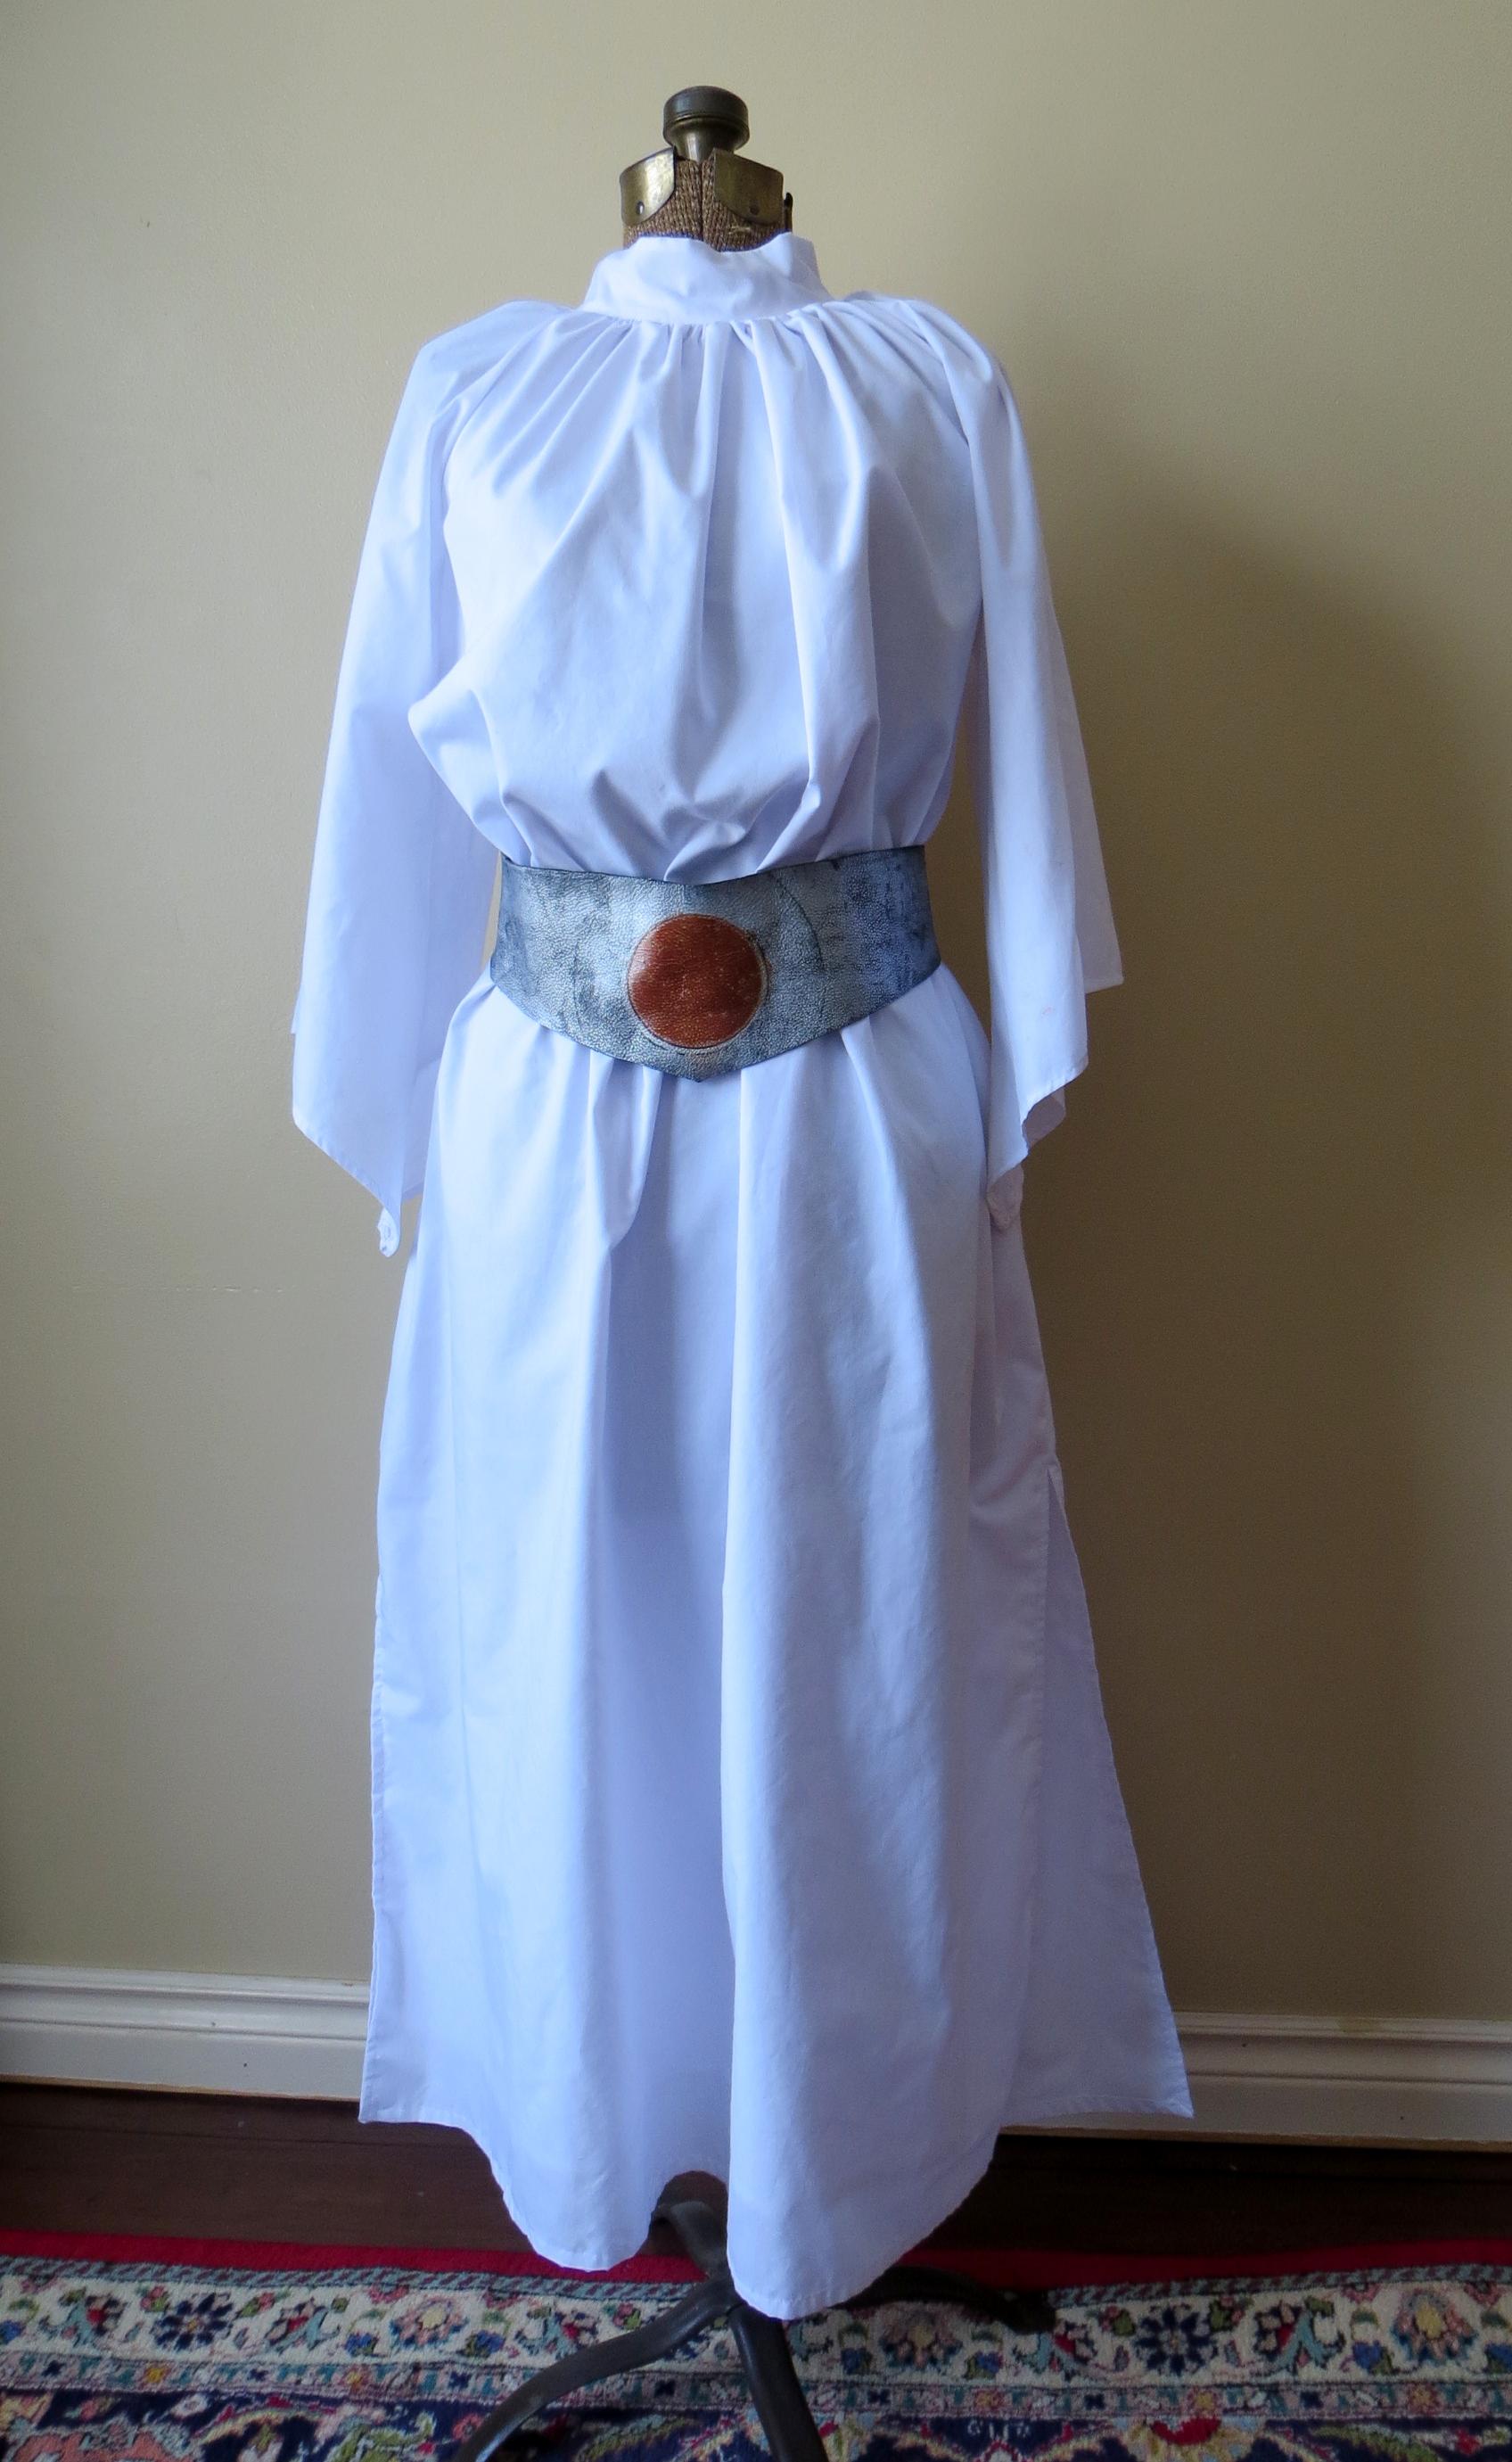 frankenpattern princess leia costume mezzo couture. Black Bedroom Furniture Sets. Home Design Ideas